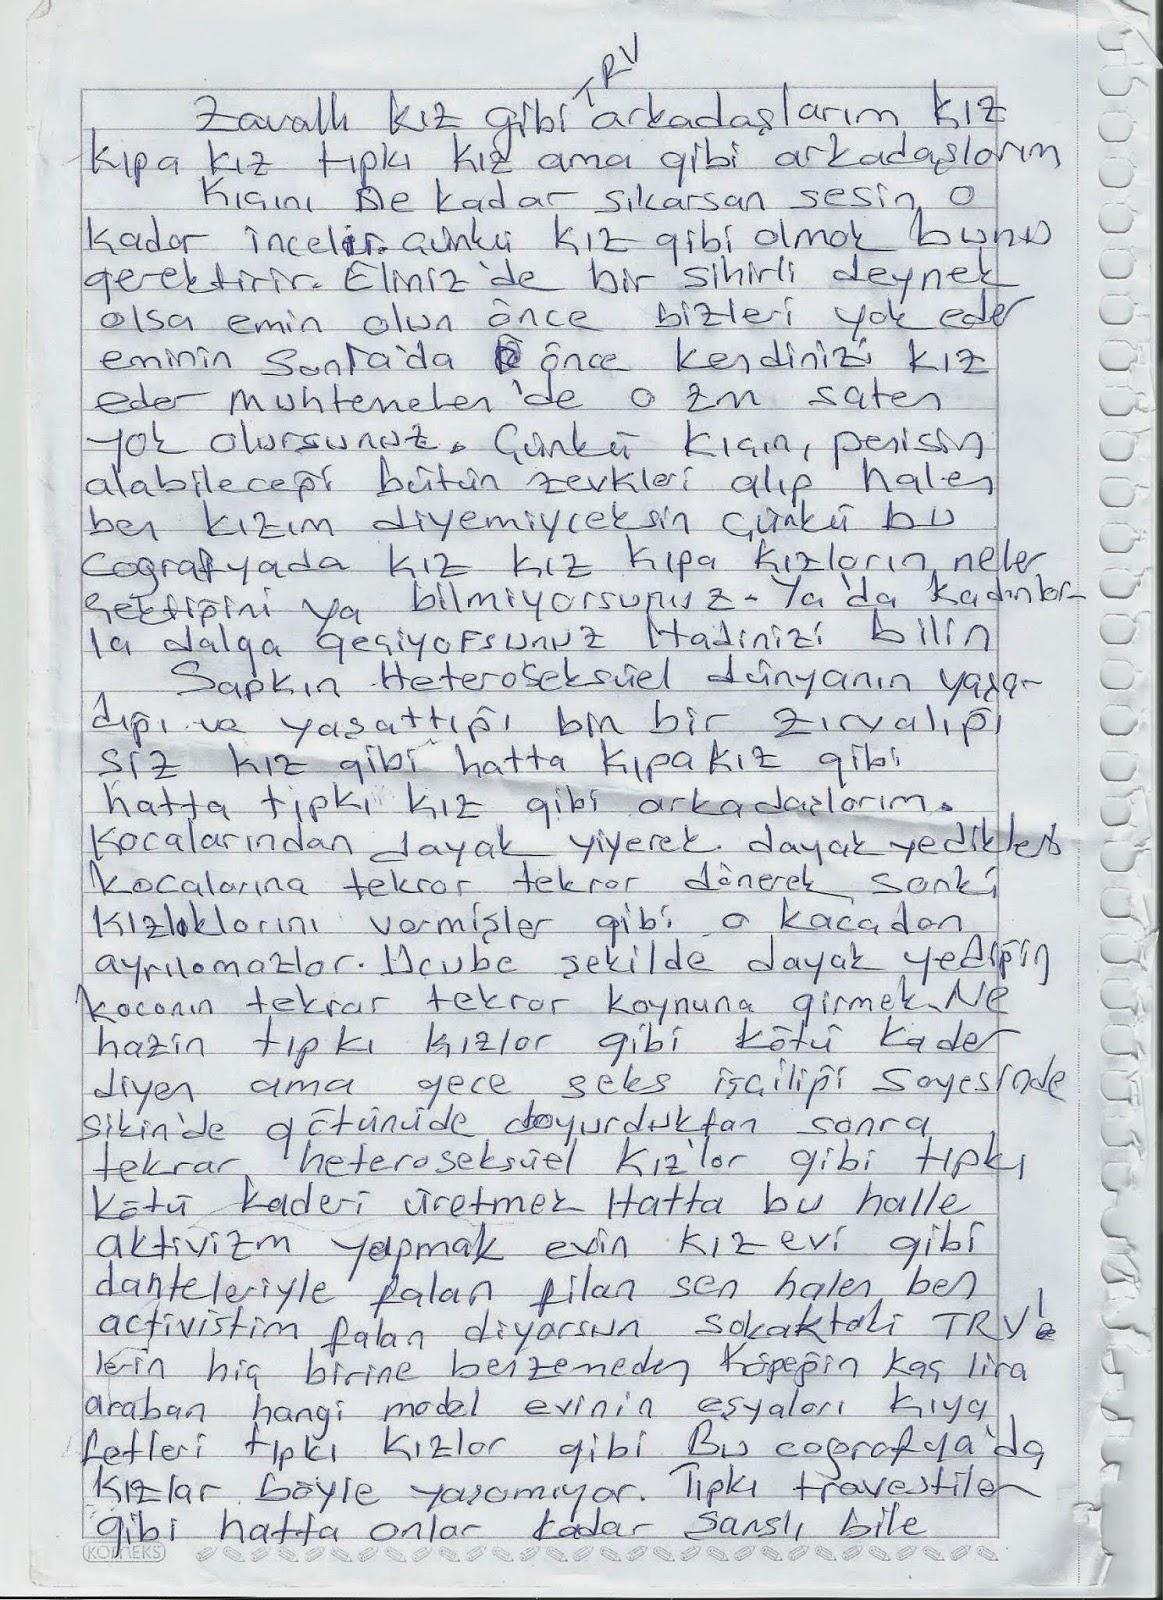 el yazması - 1